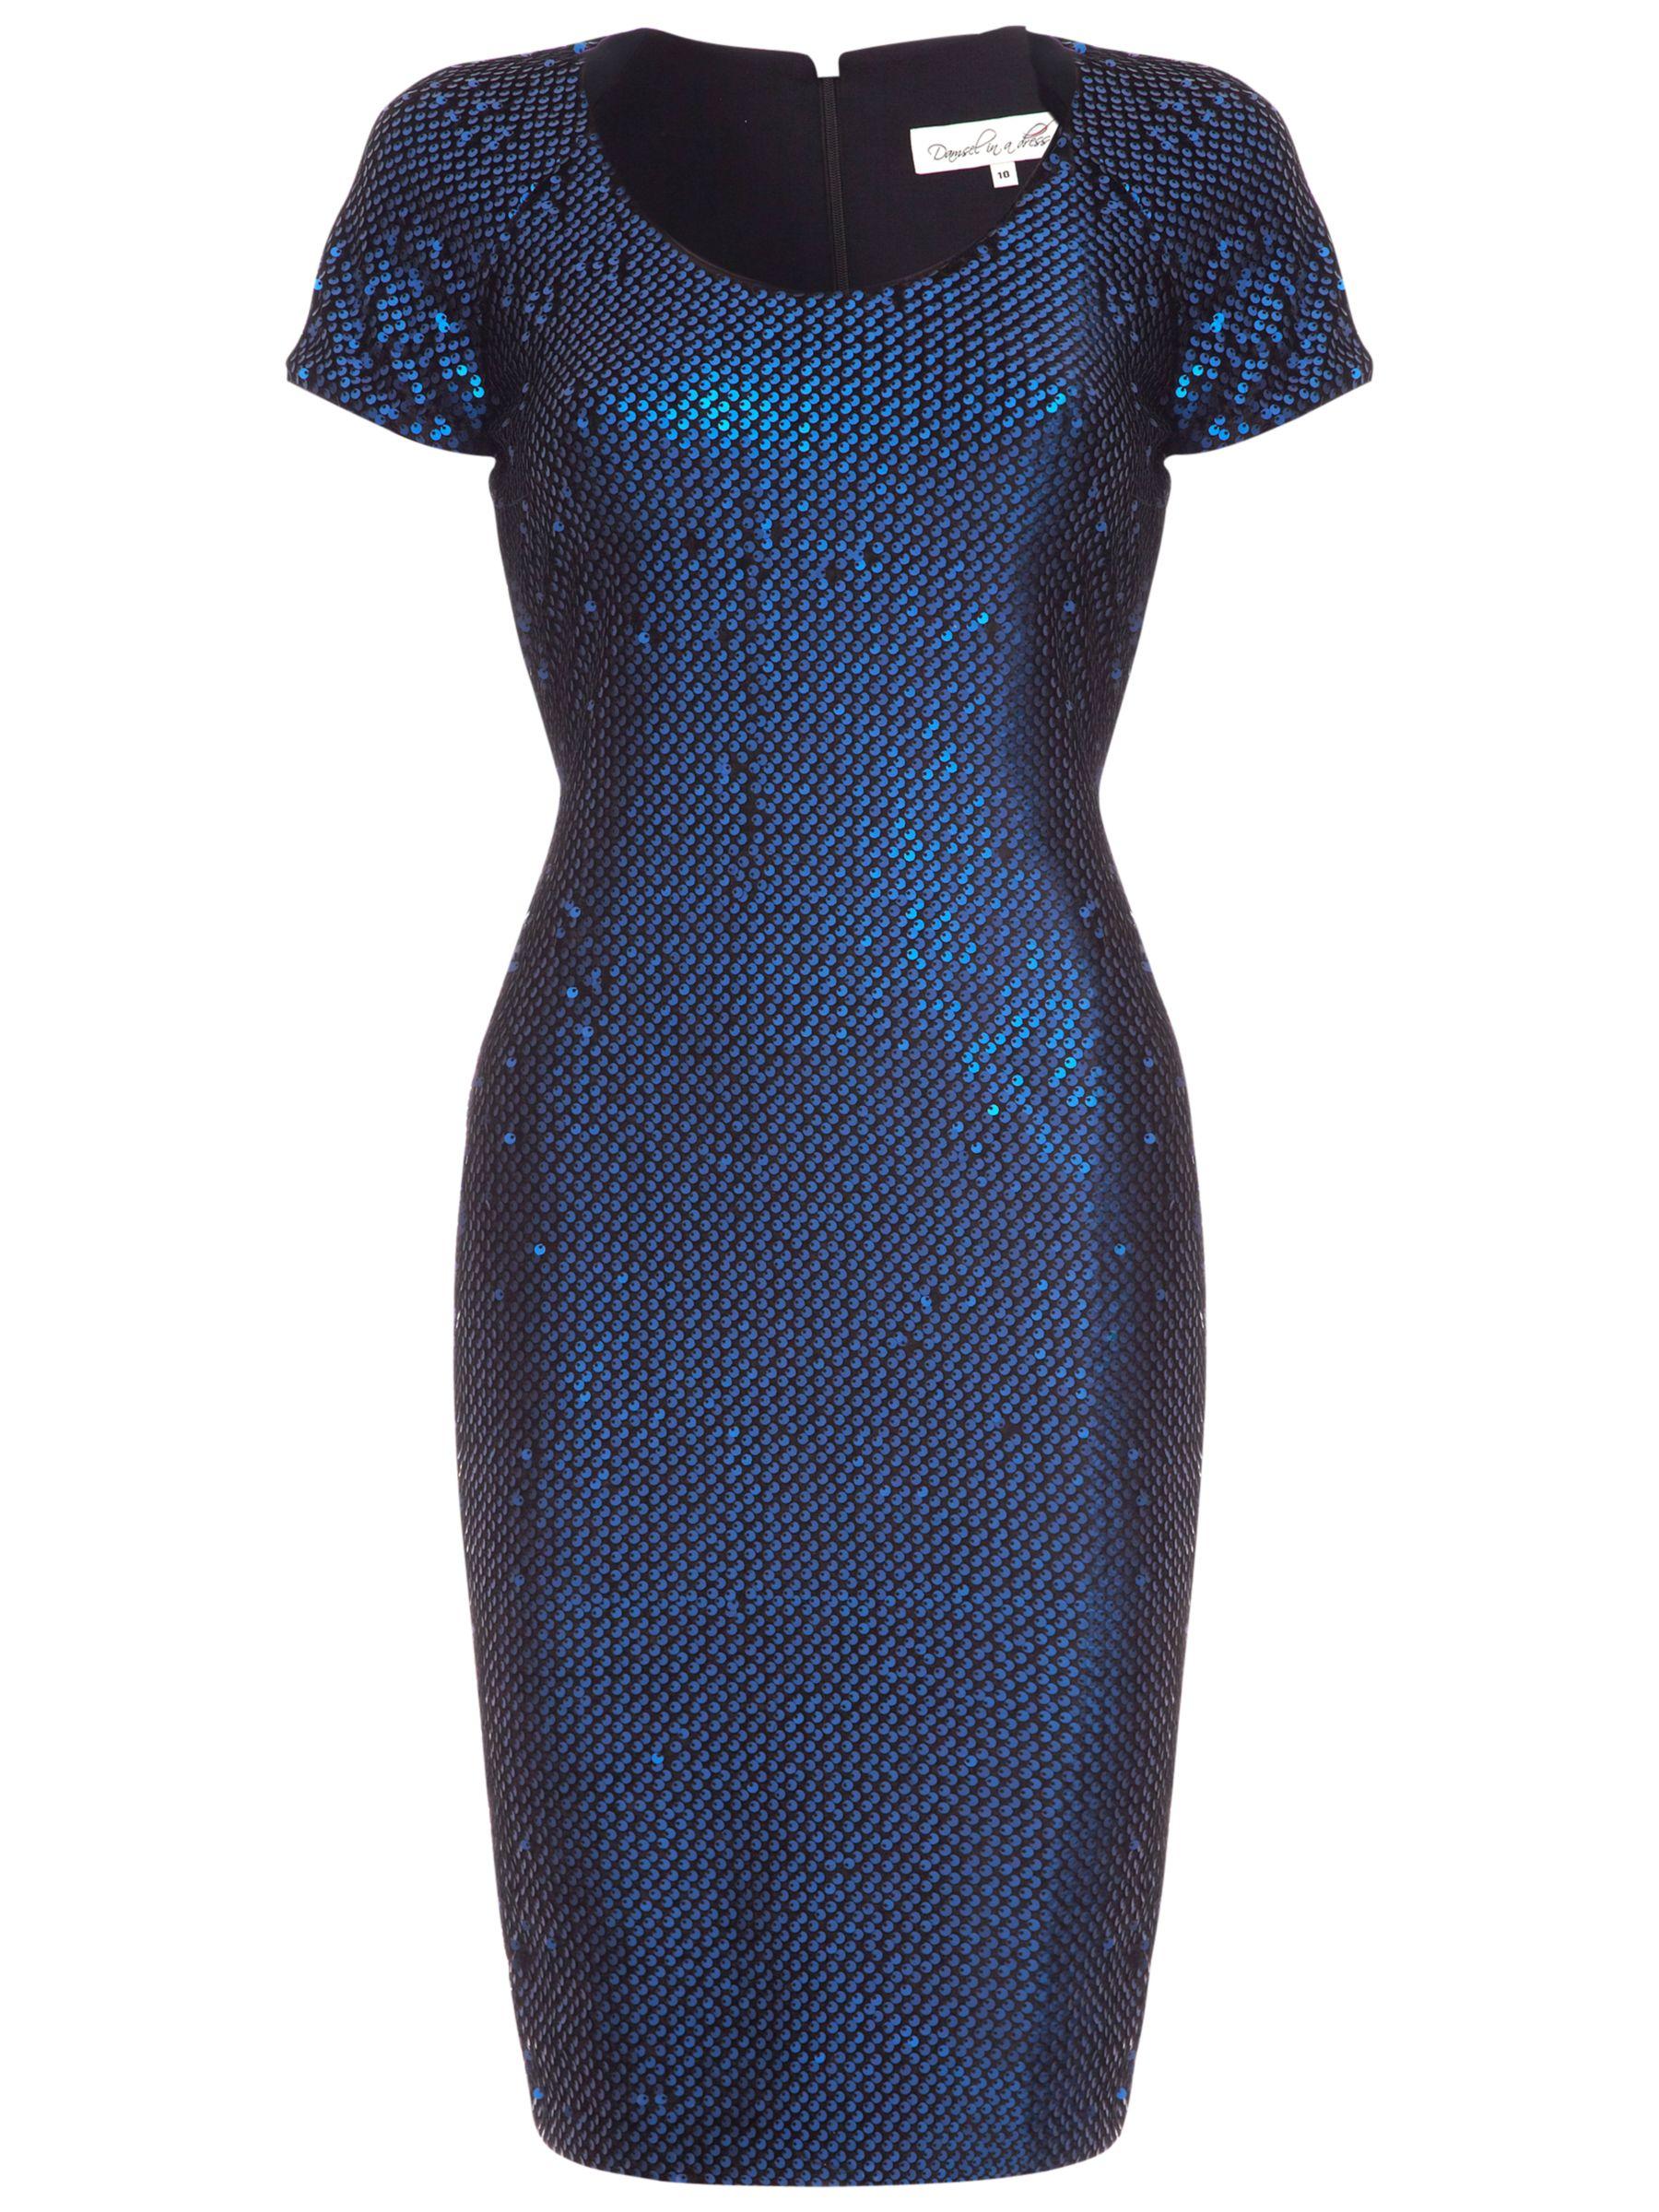 Damsel in a dress Albury Dress, Blue/Black